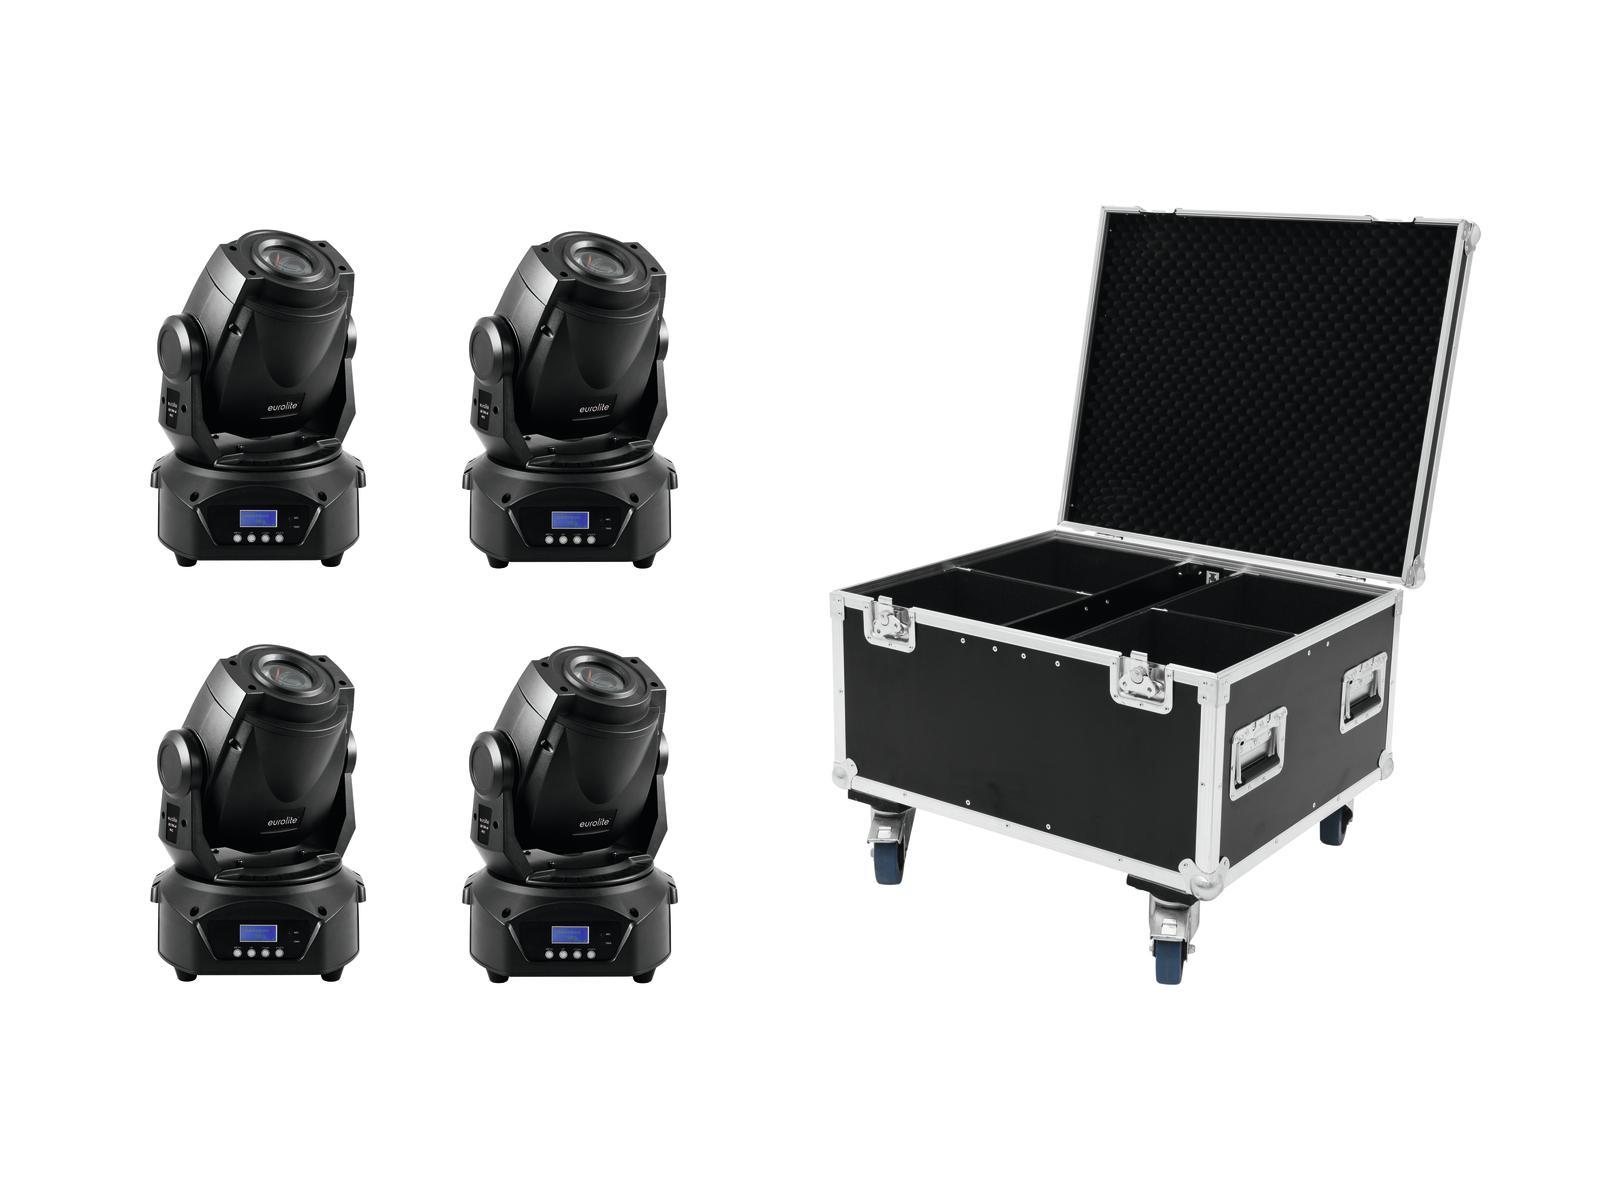 EUROLITE Set 4x LED TMH-60 MK2 + Case